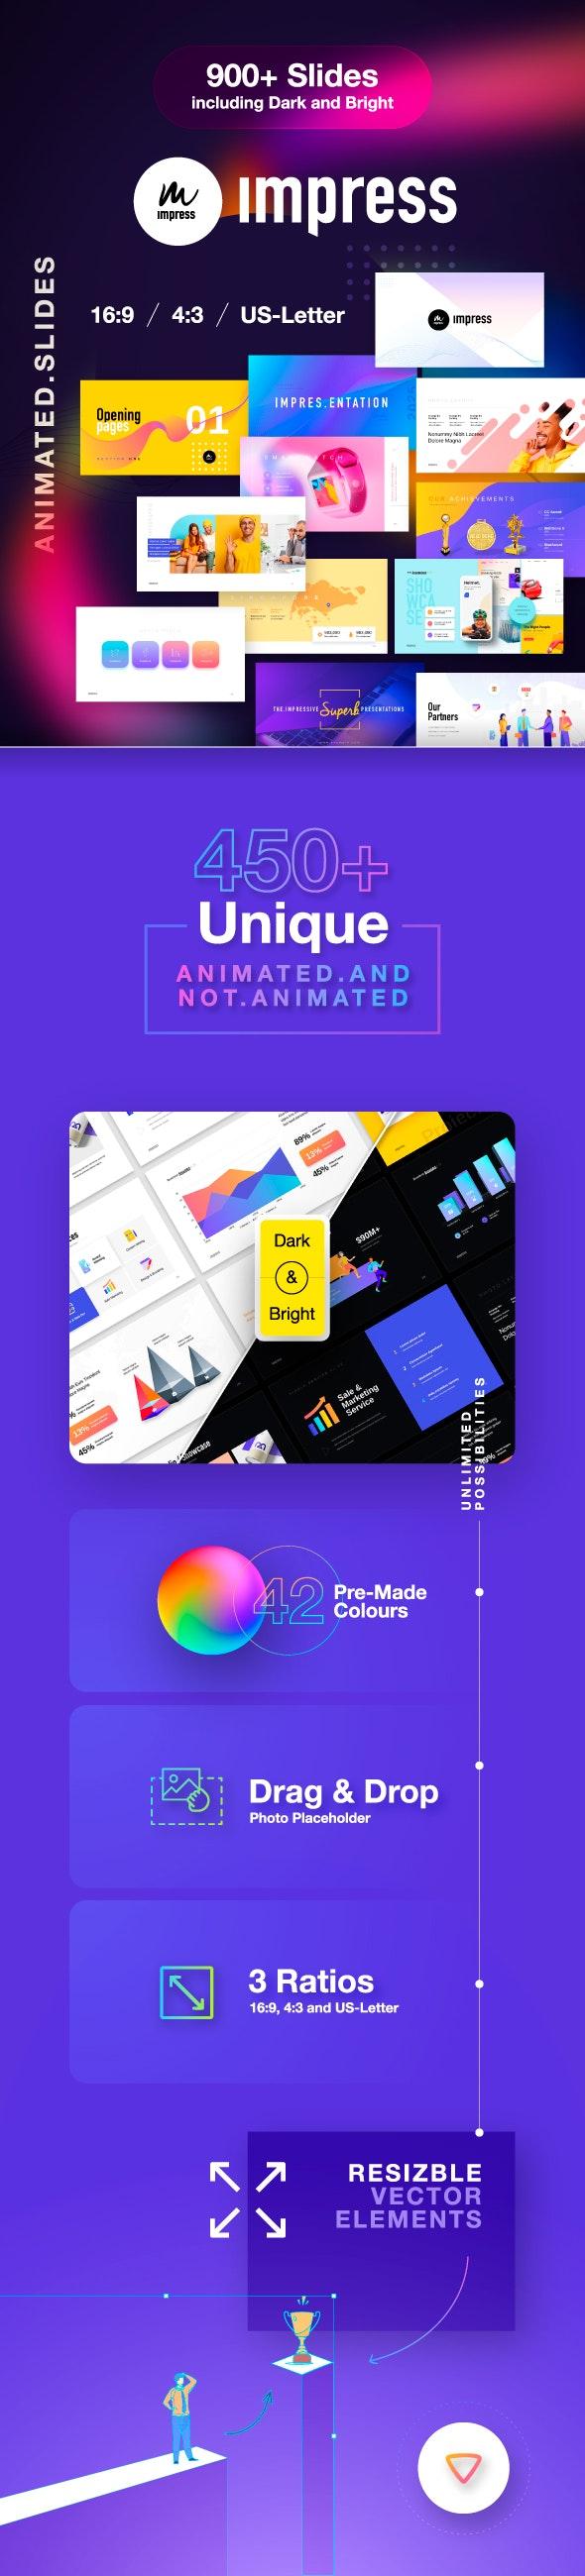 Impress | Business Presentation Template